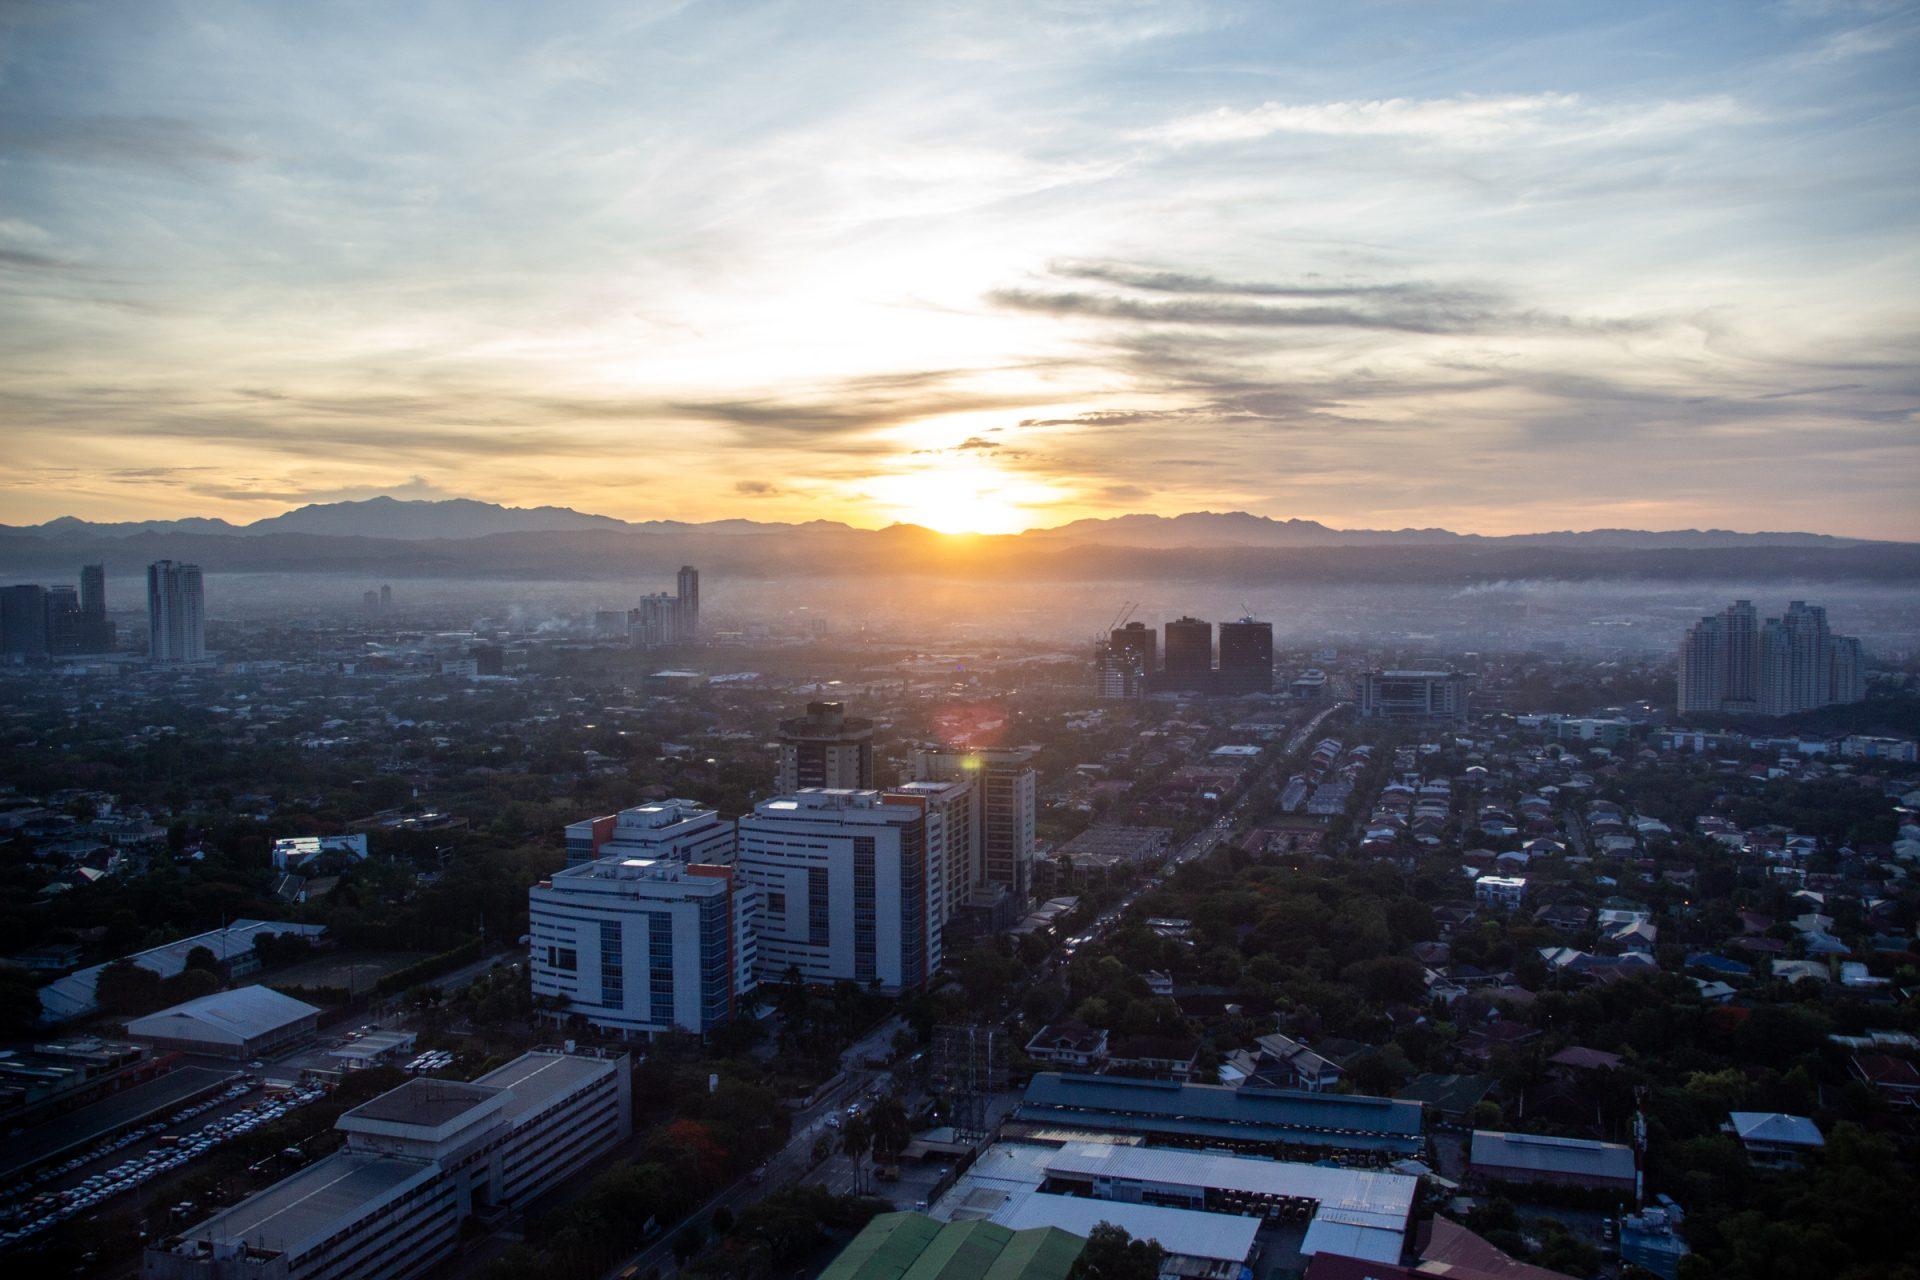 Sun Behind Mountains Beyond City